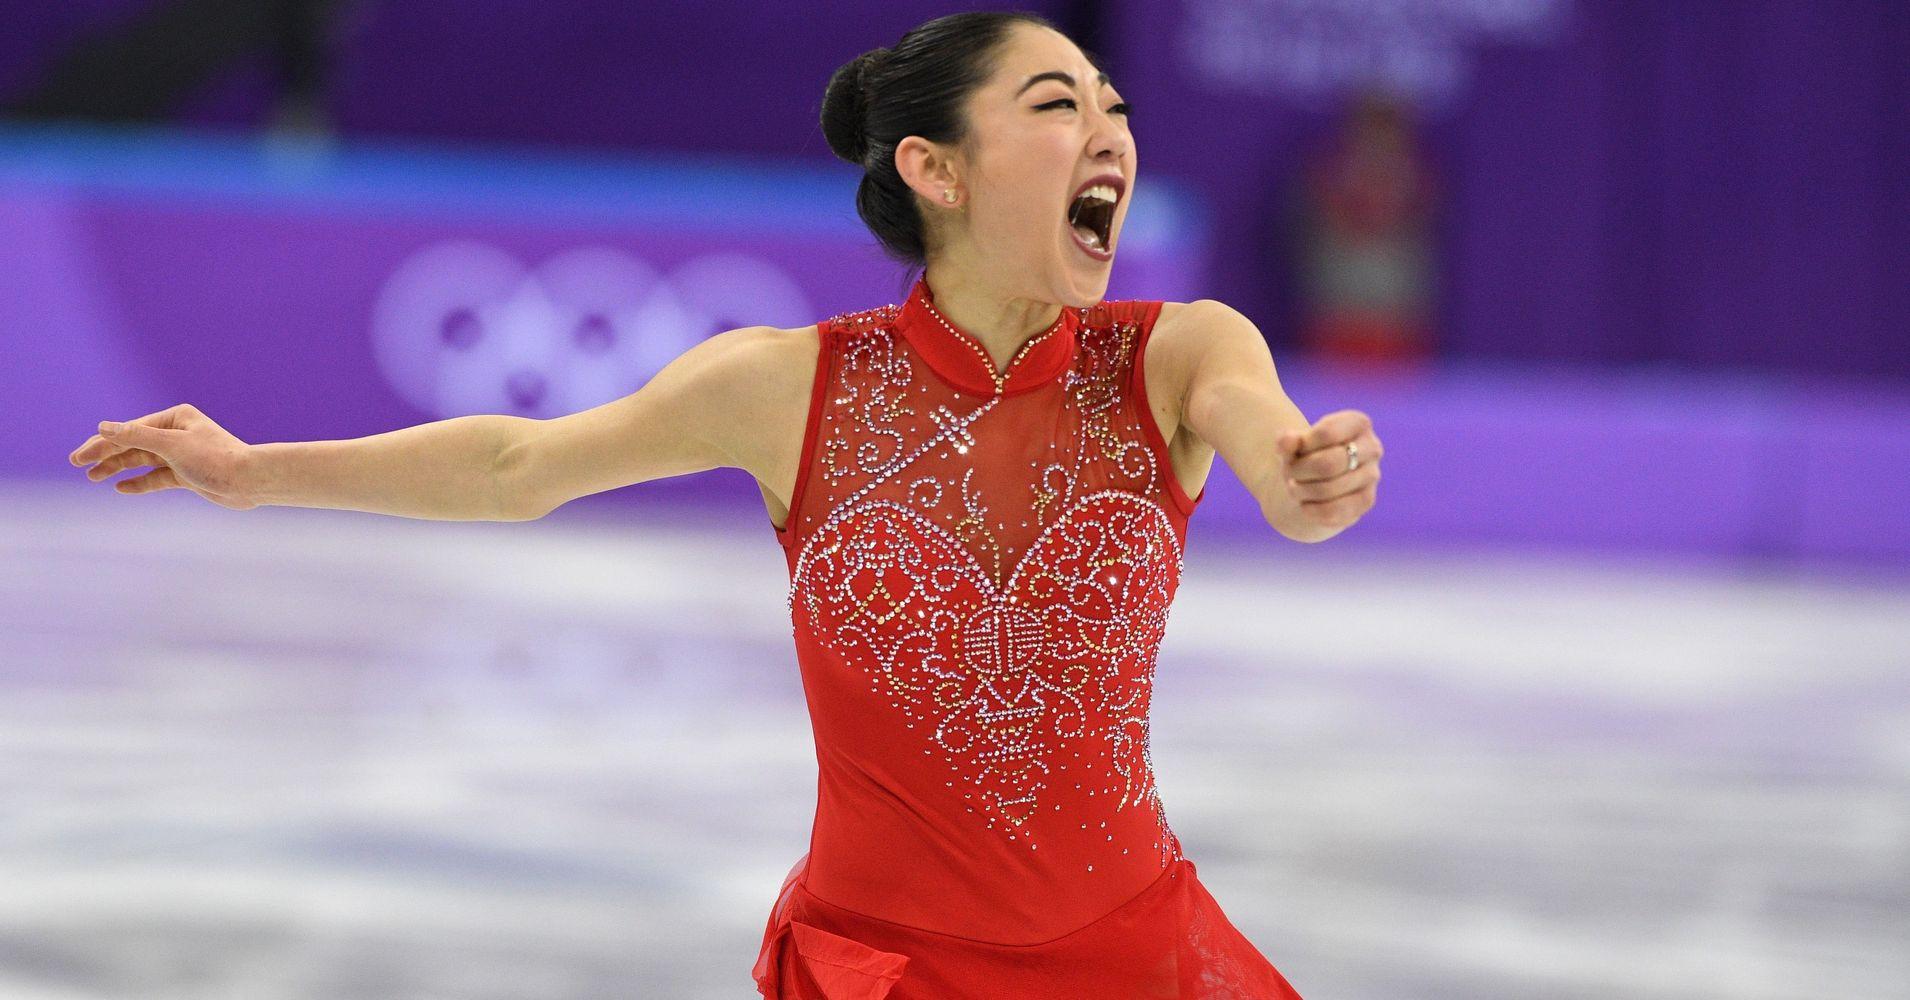 Figure Skater Mirai Nagasu Becomes First U.S. Woman To Land Triple Axel At Olympics